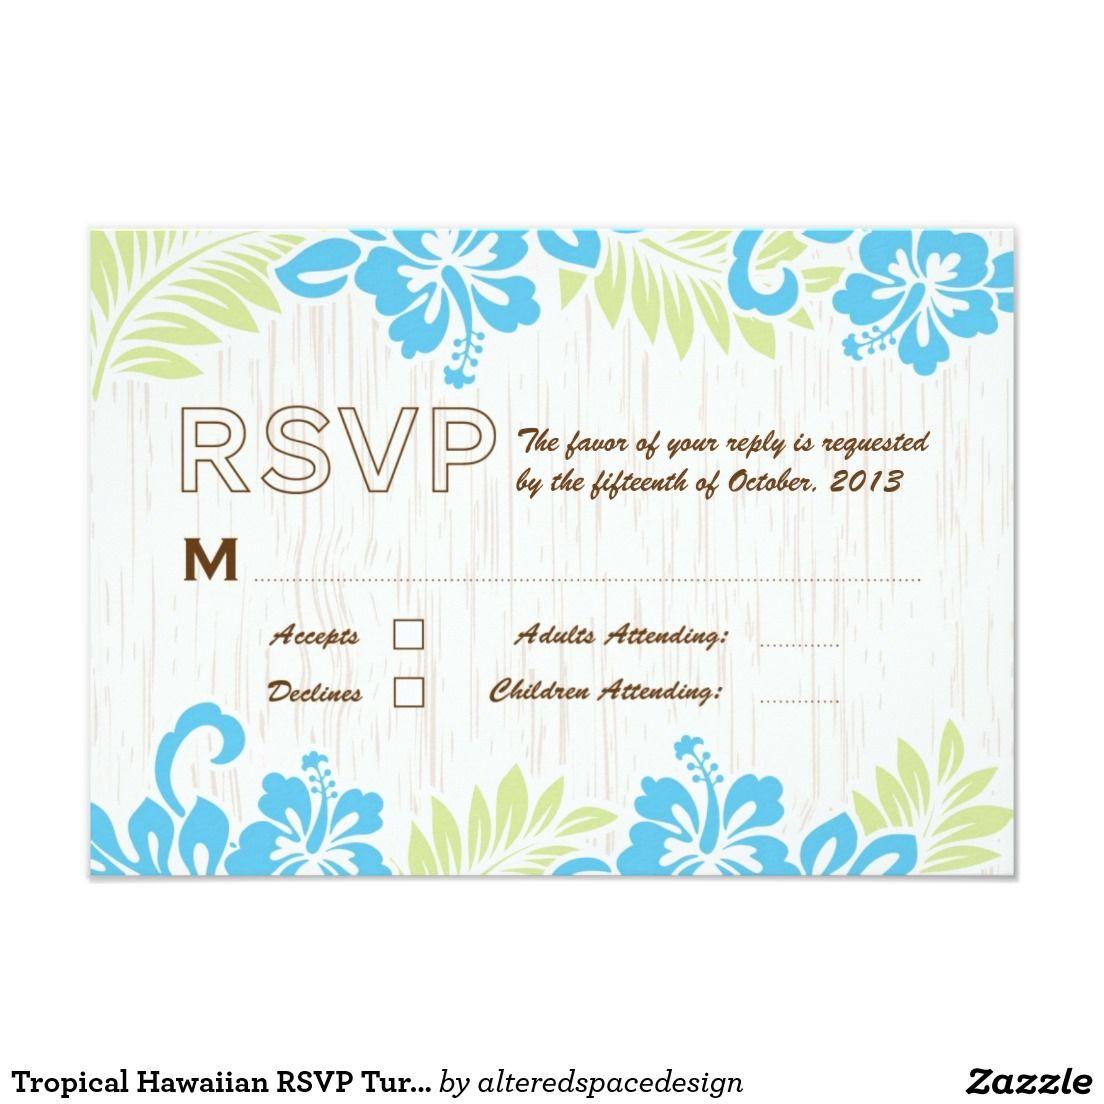 Tropical Hawaiian RSVP Turquoise Card | Beach wedding invitations ...